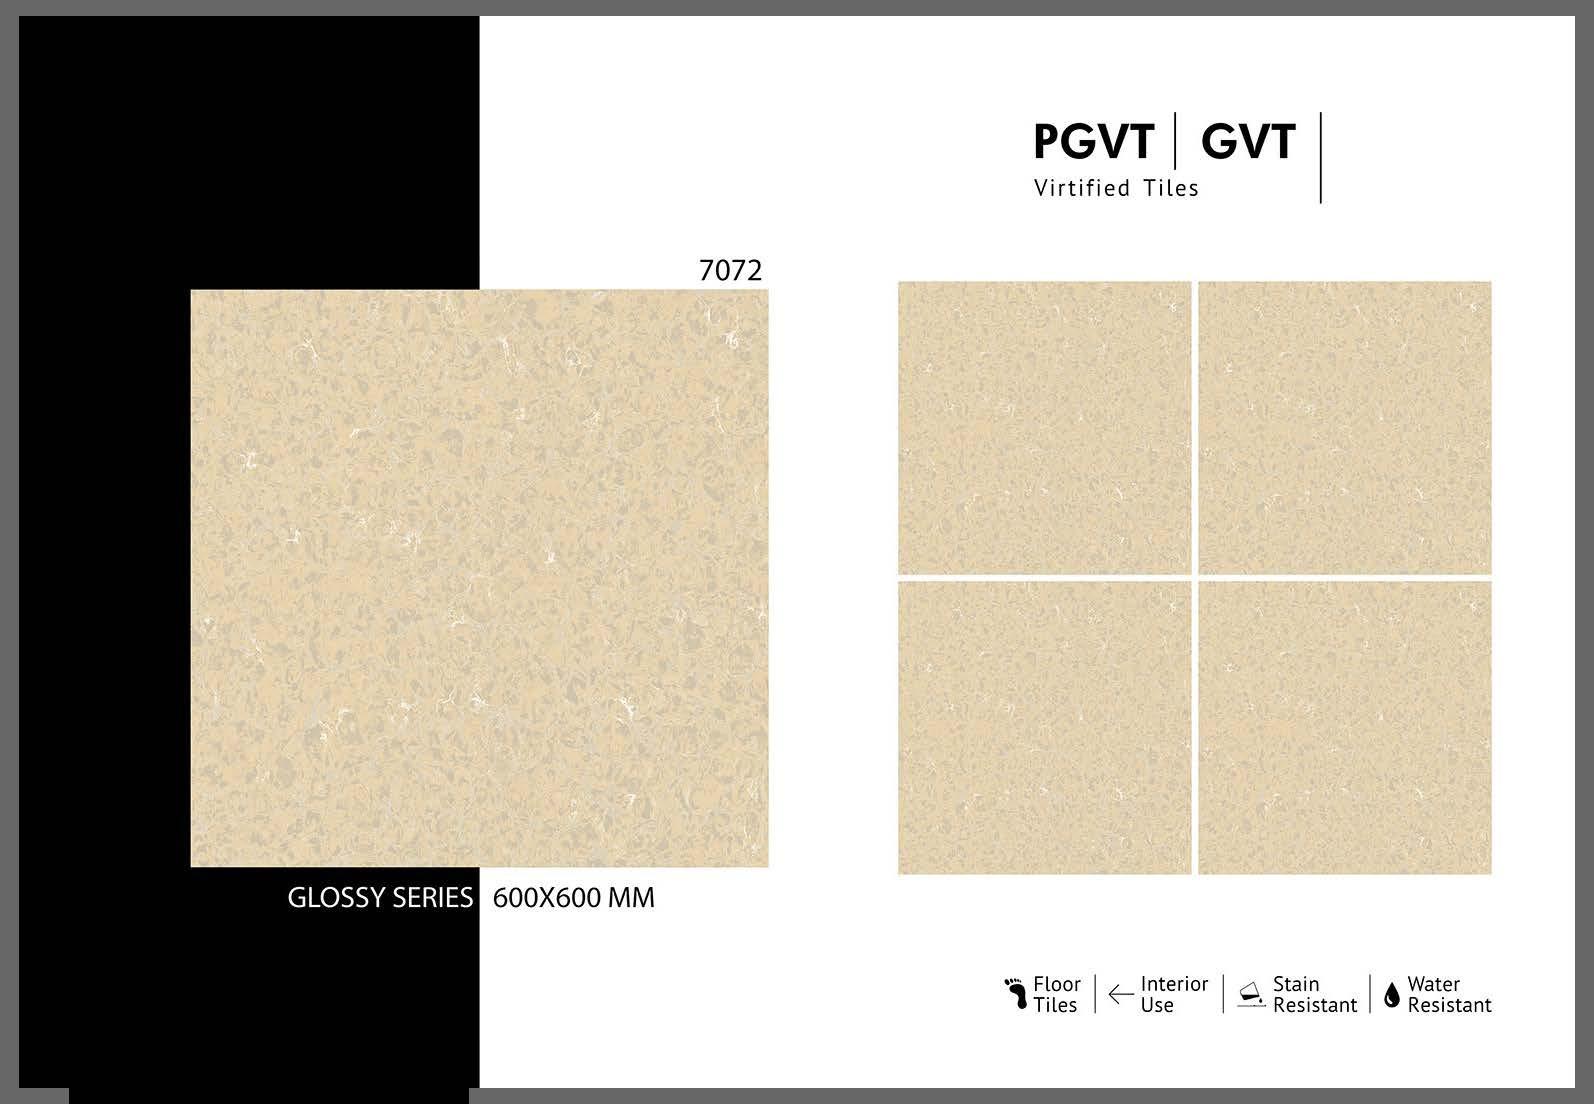 GVT 2X2 GLOSSY_Page_59.jpg